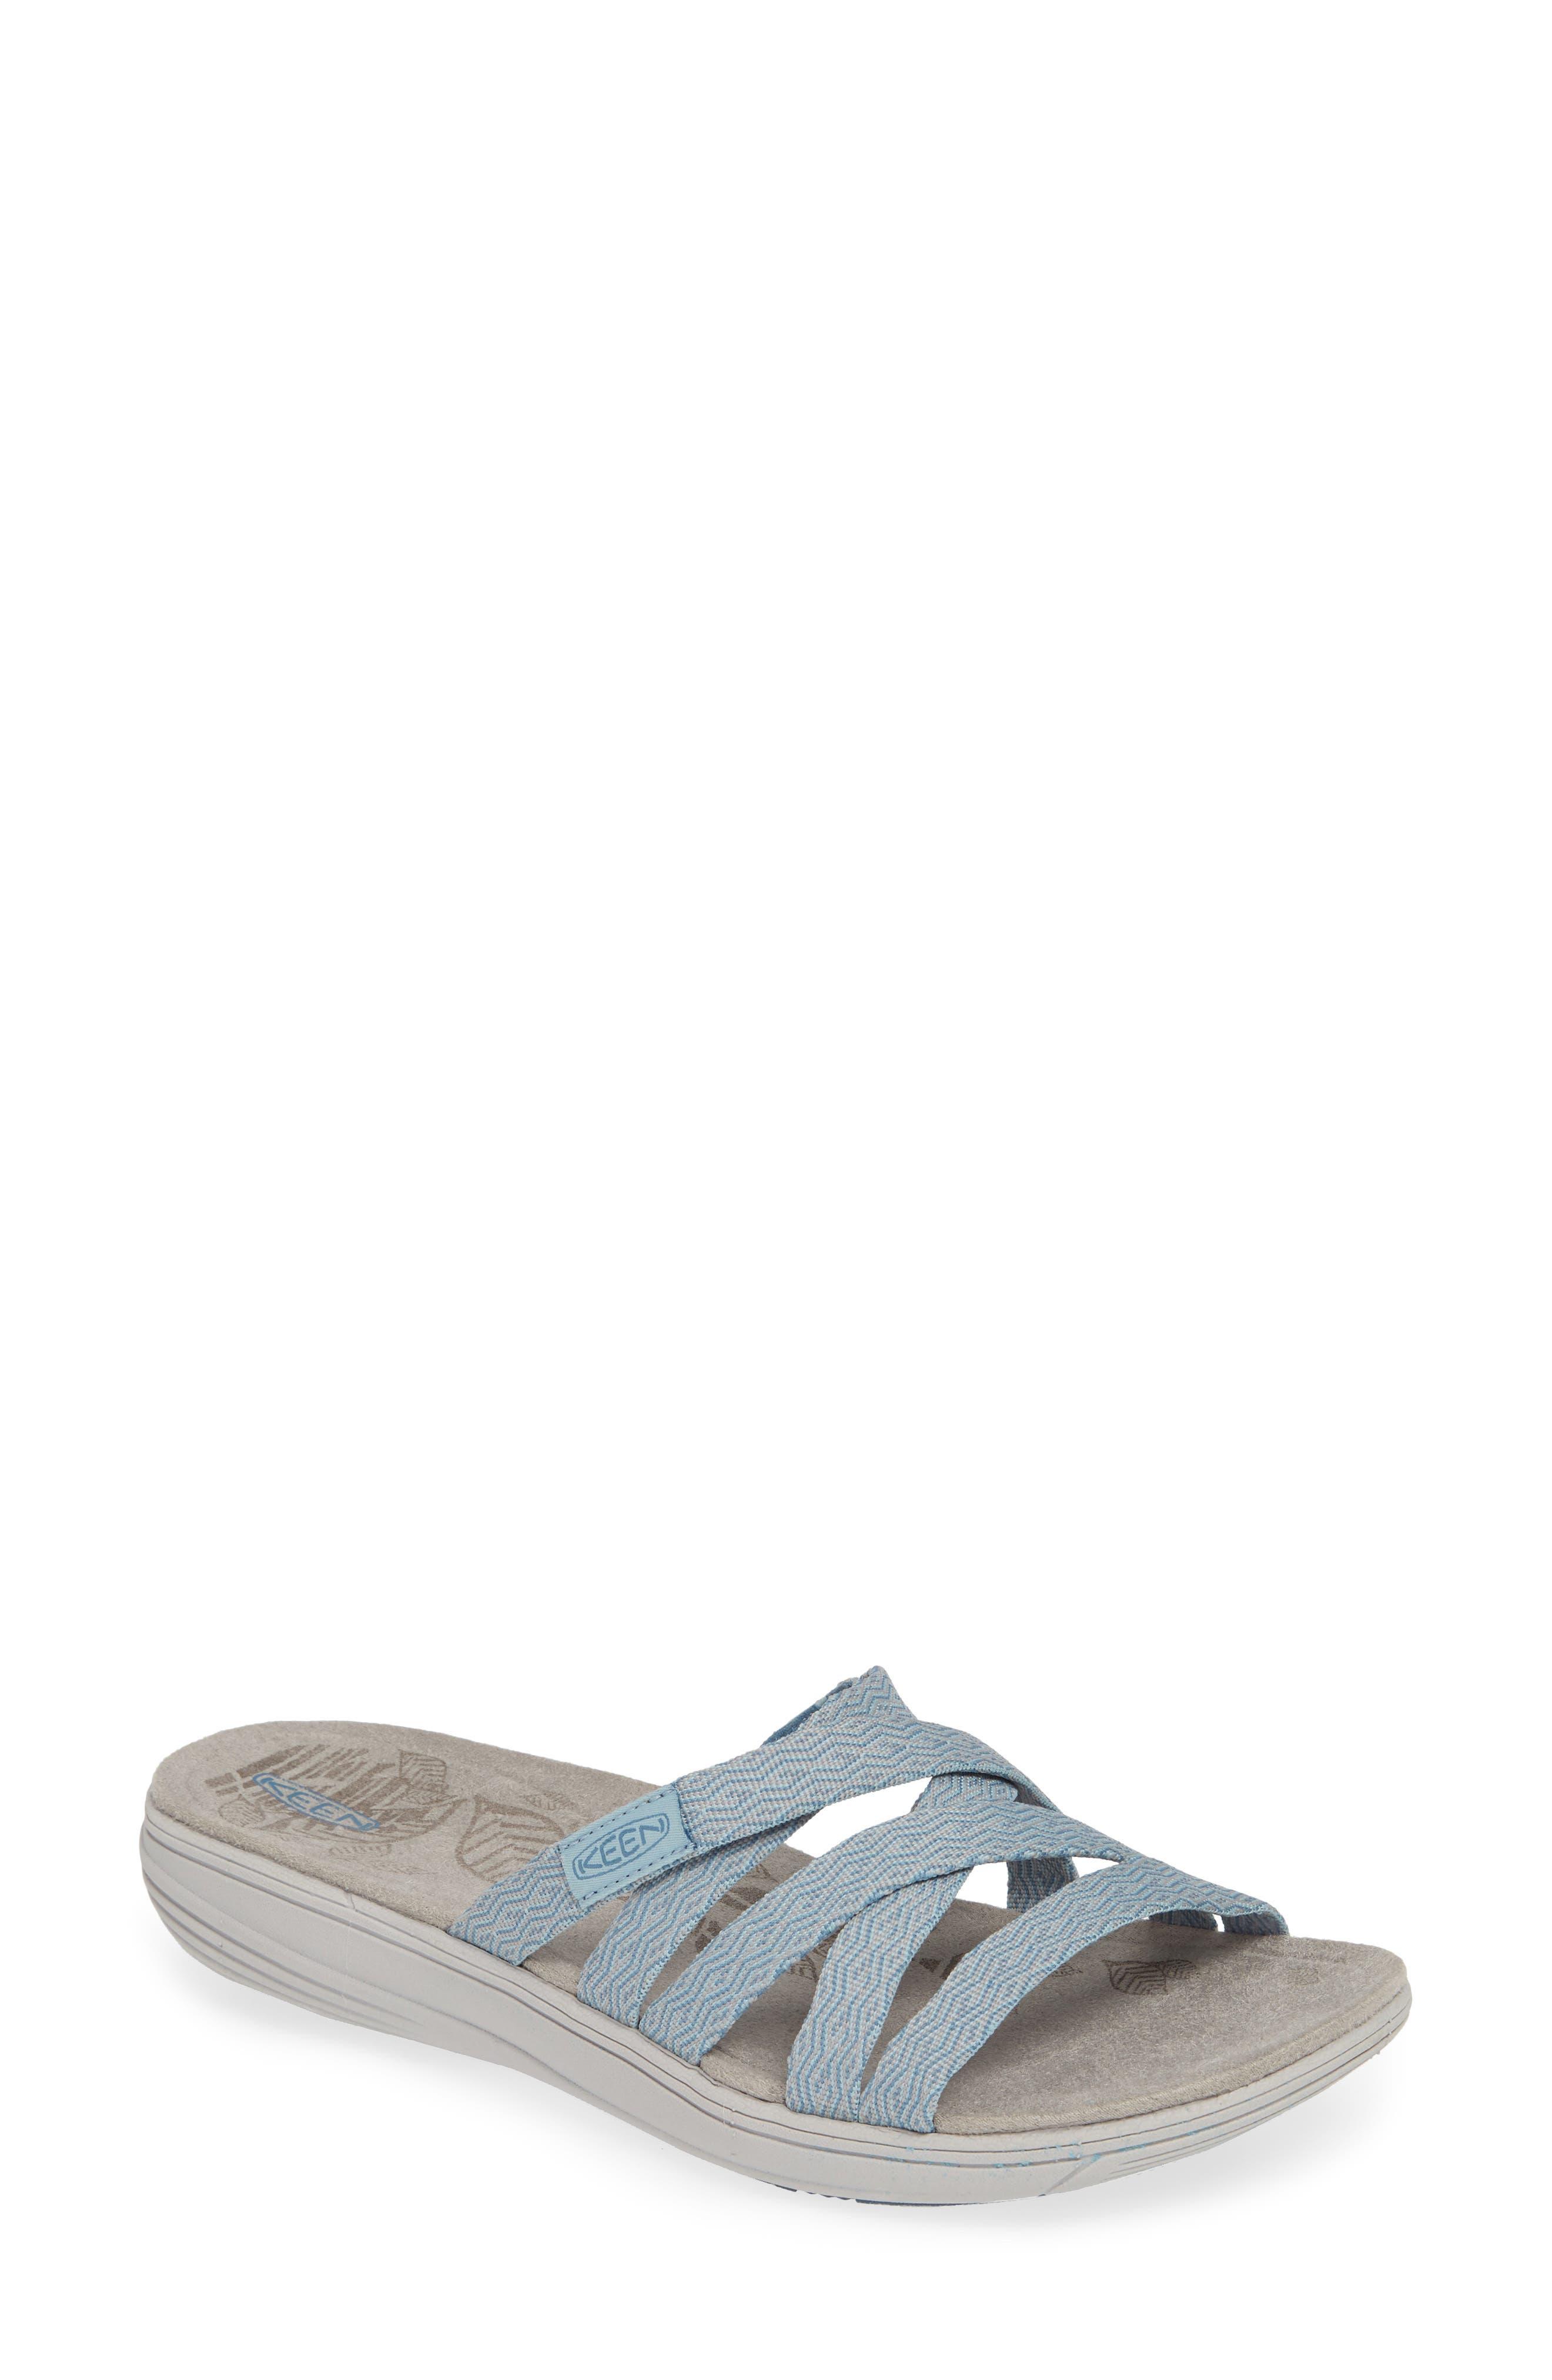 Keen Damaya Slide Sandal, Blue